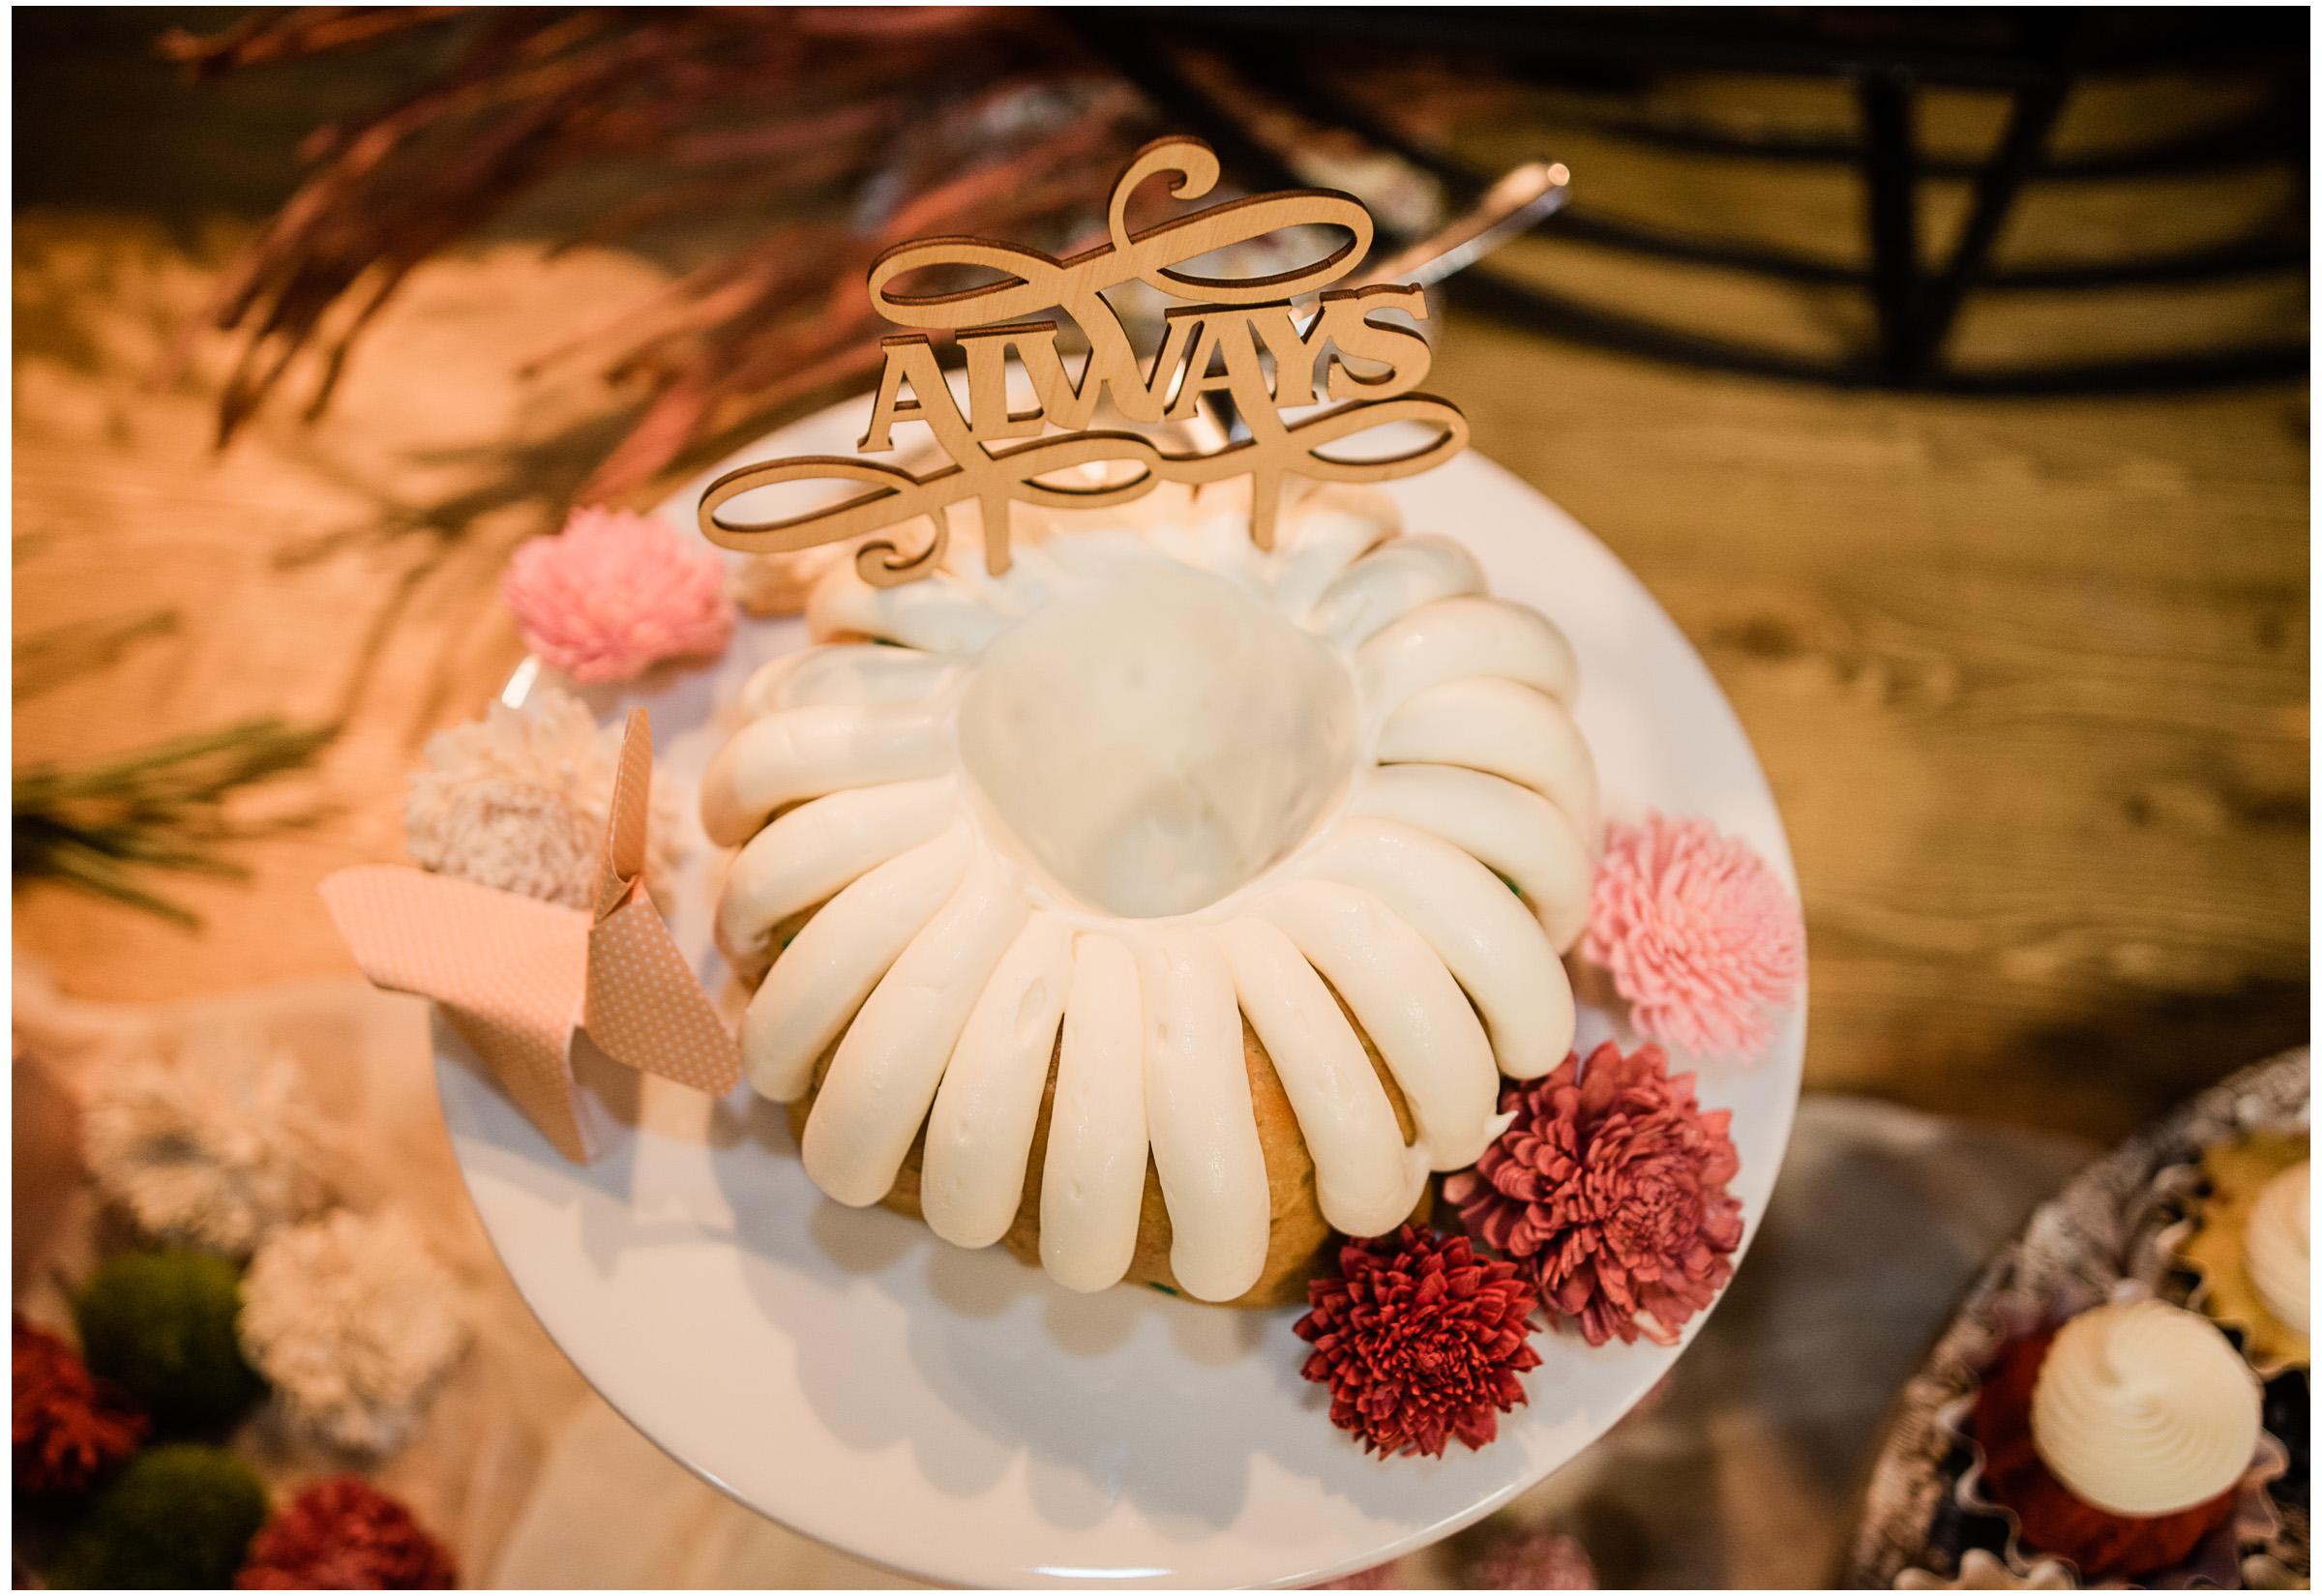 Loomis Wedding - Sacramento Photographer - Blue Goose - Justin Wilcox Photography - 19.jpg